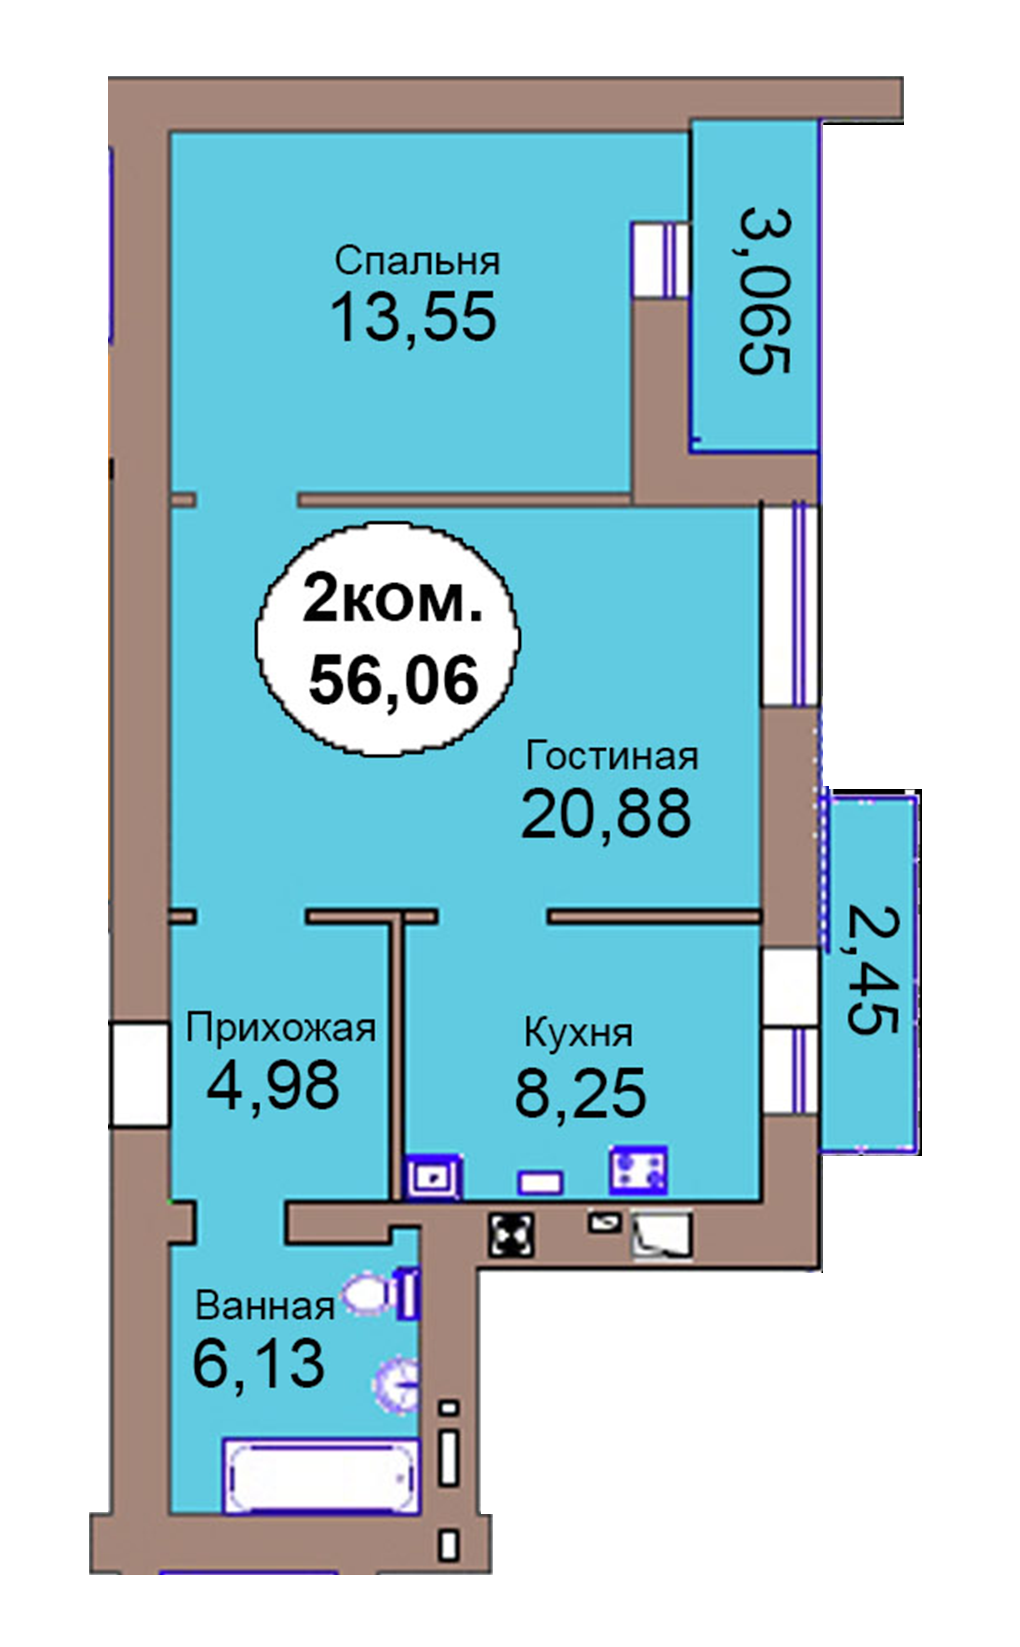 2-комн. кв. по пер. Калининградский, 4  кв. 144 в Калининграде